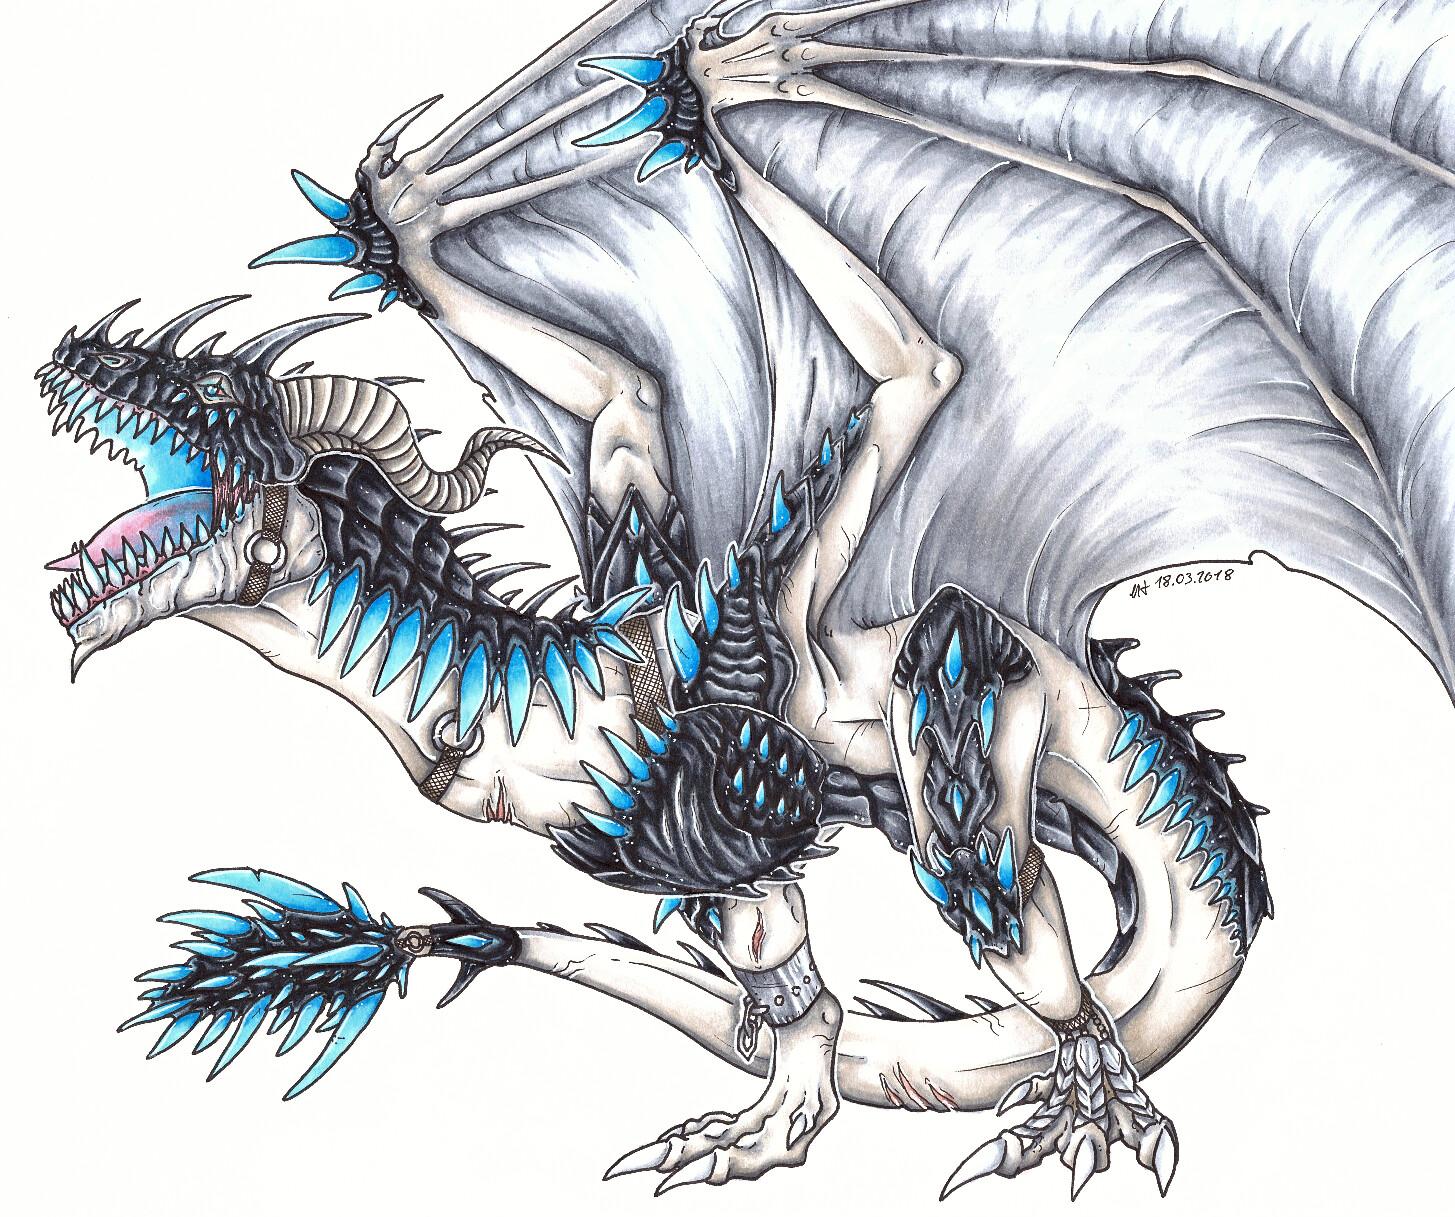 Artstation Furious Dragon With Black Armor Kronoluna See more ideas about dragon scale armor, dragon scale, dragon. furious dragon with black armor kronoluna